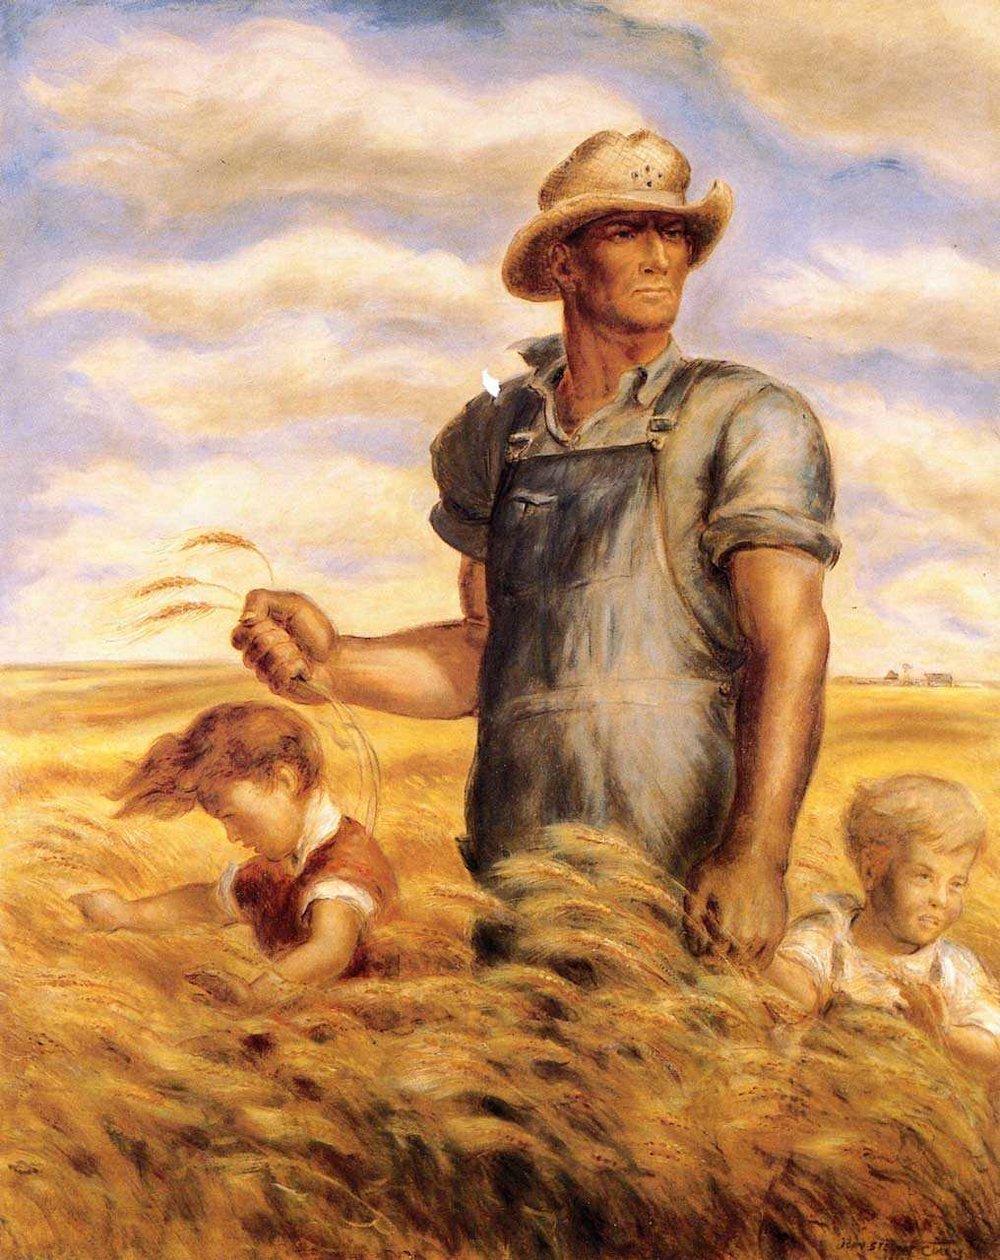 John Steuart Curry,  Our Good Earth